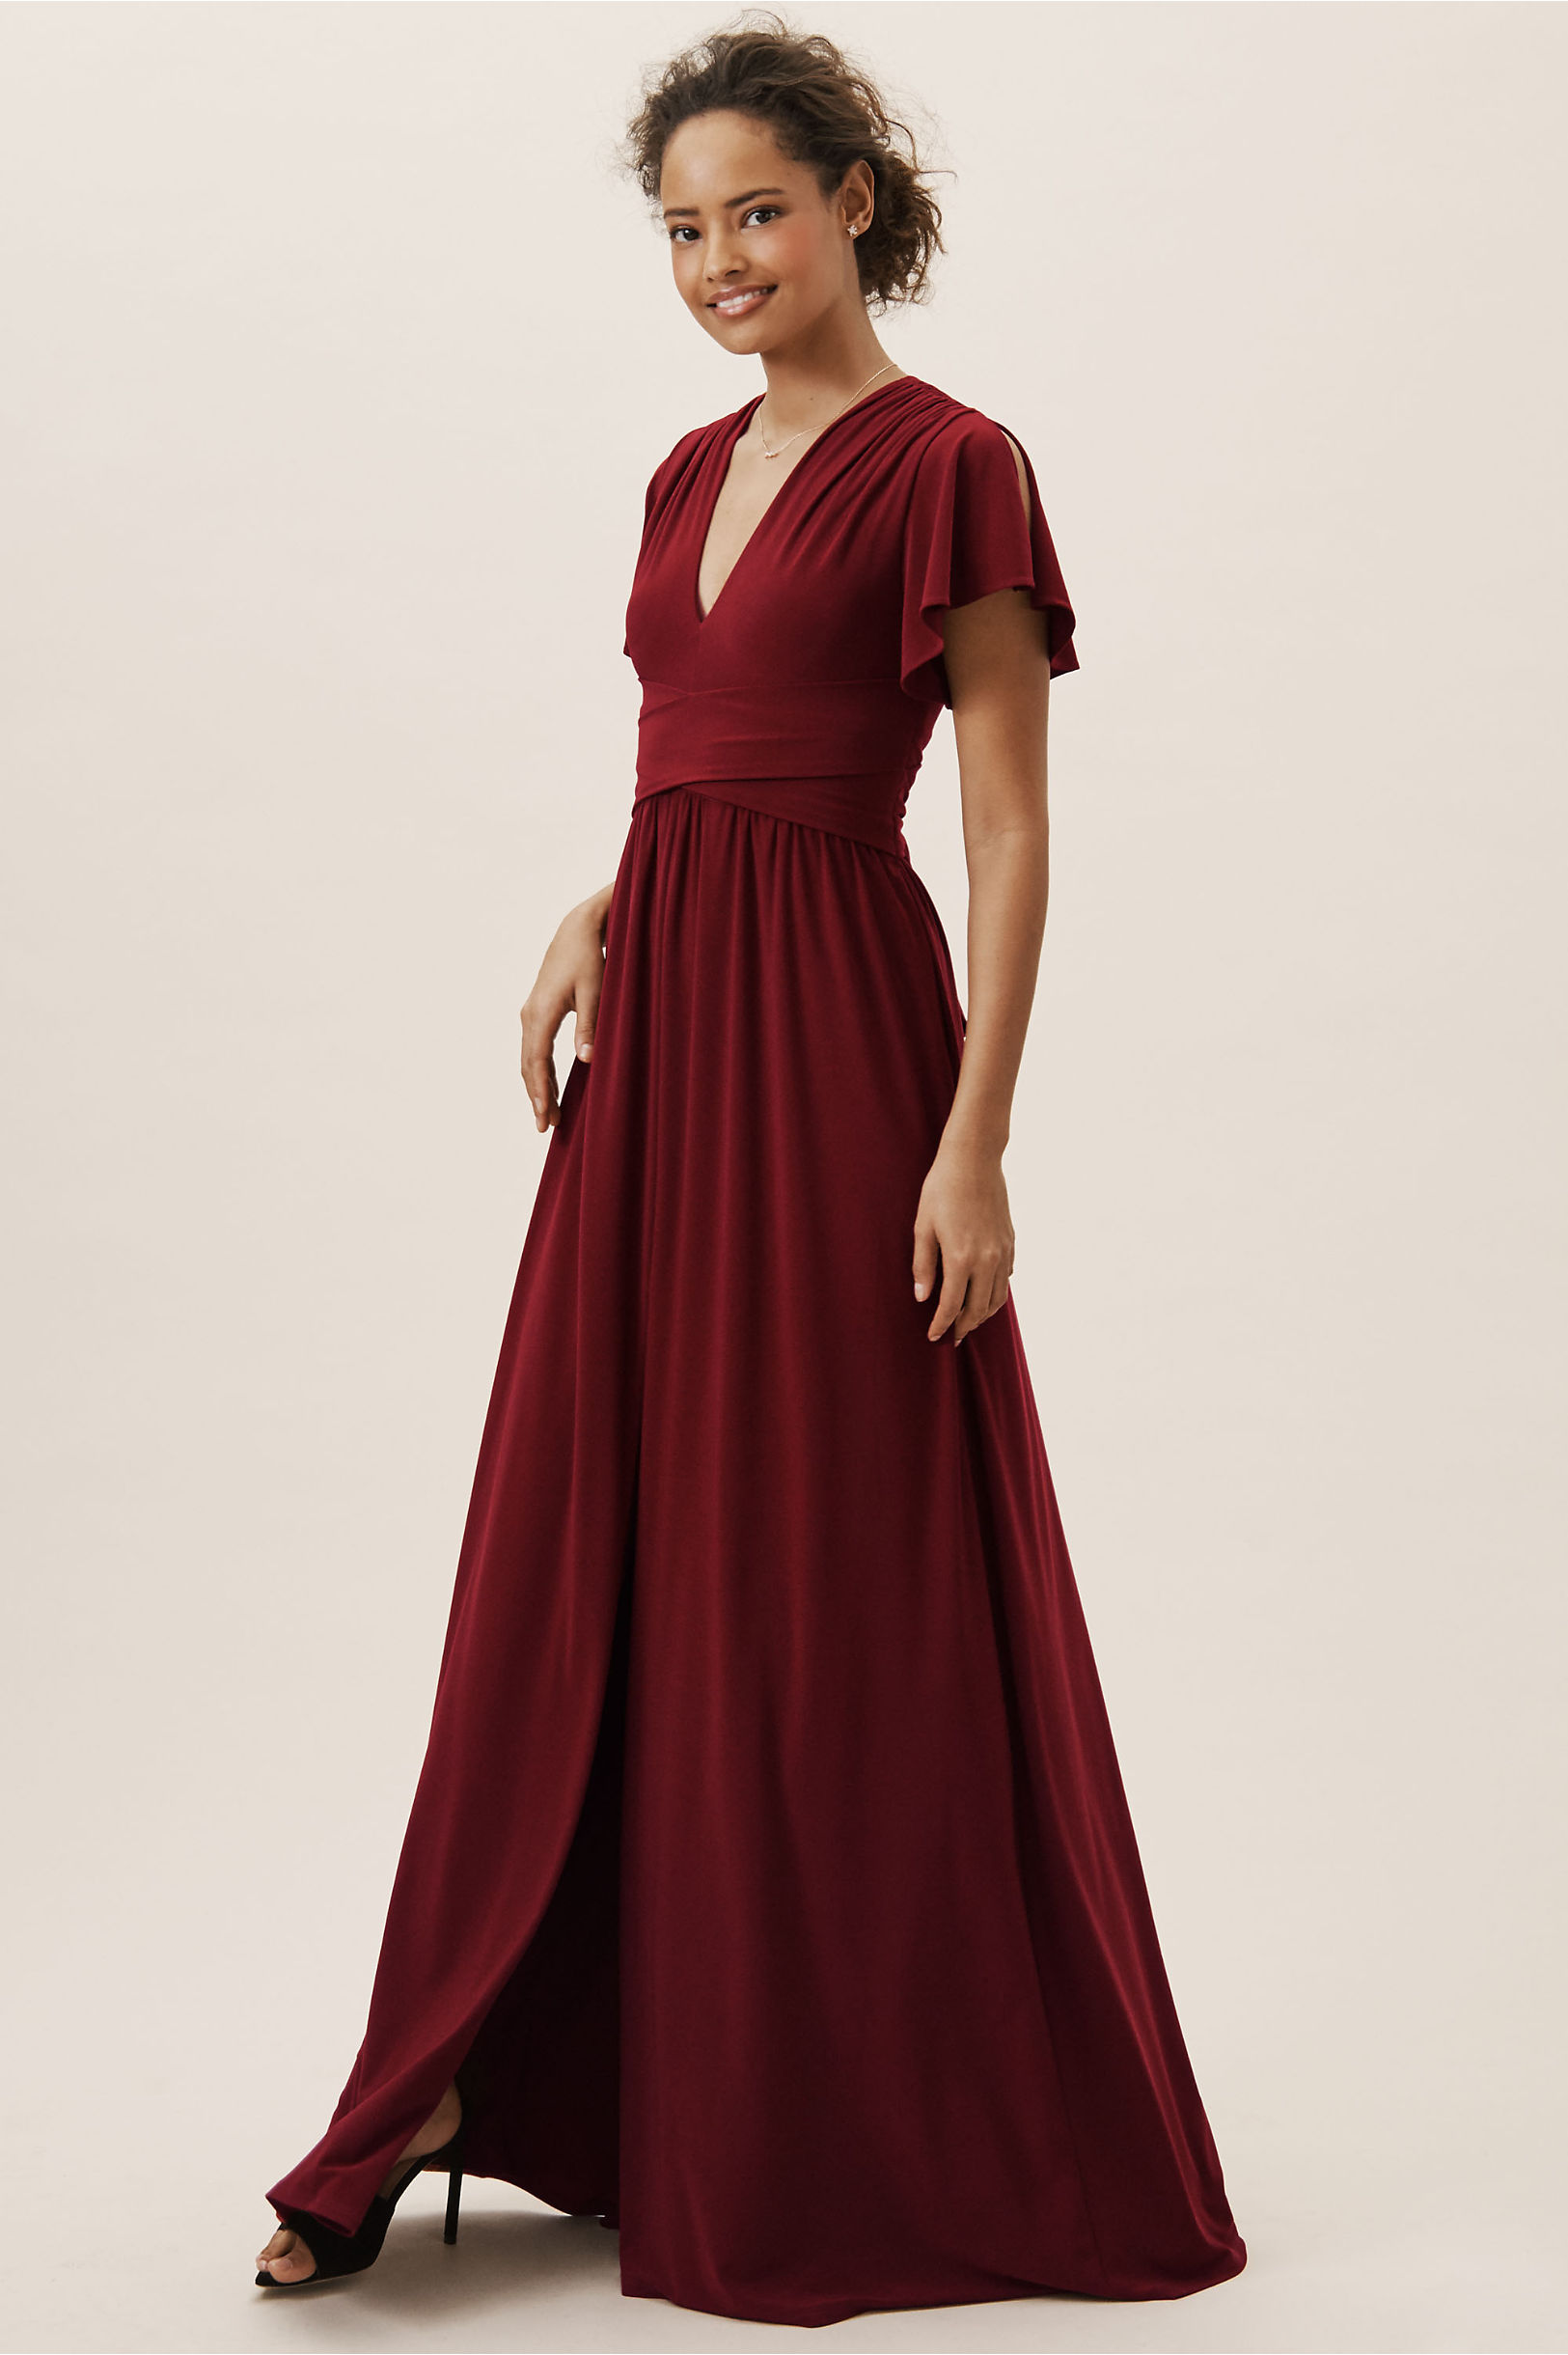 BHLDN Red Mendoza Bridesmaids Dress with Short Sleeves